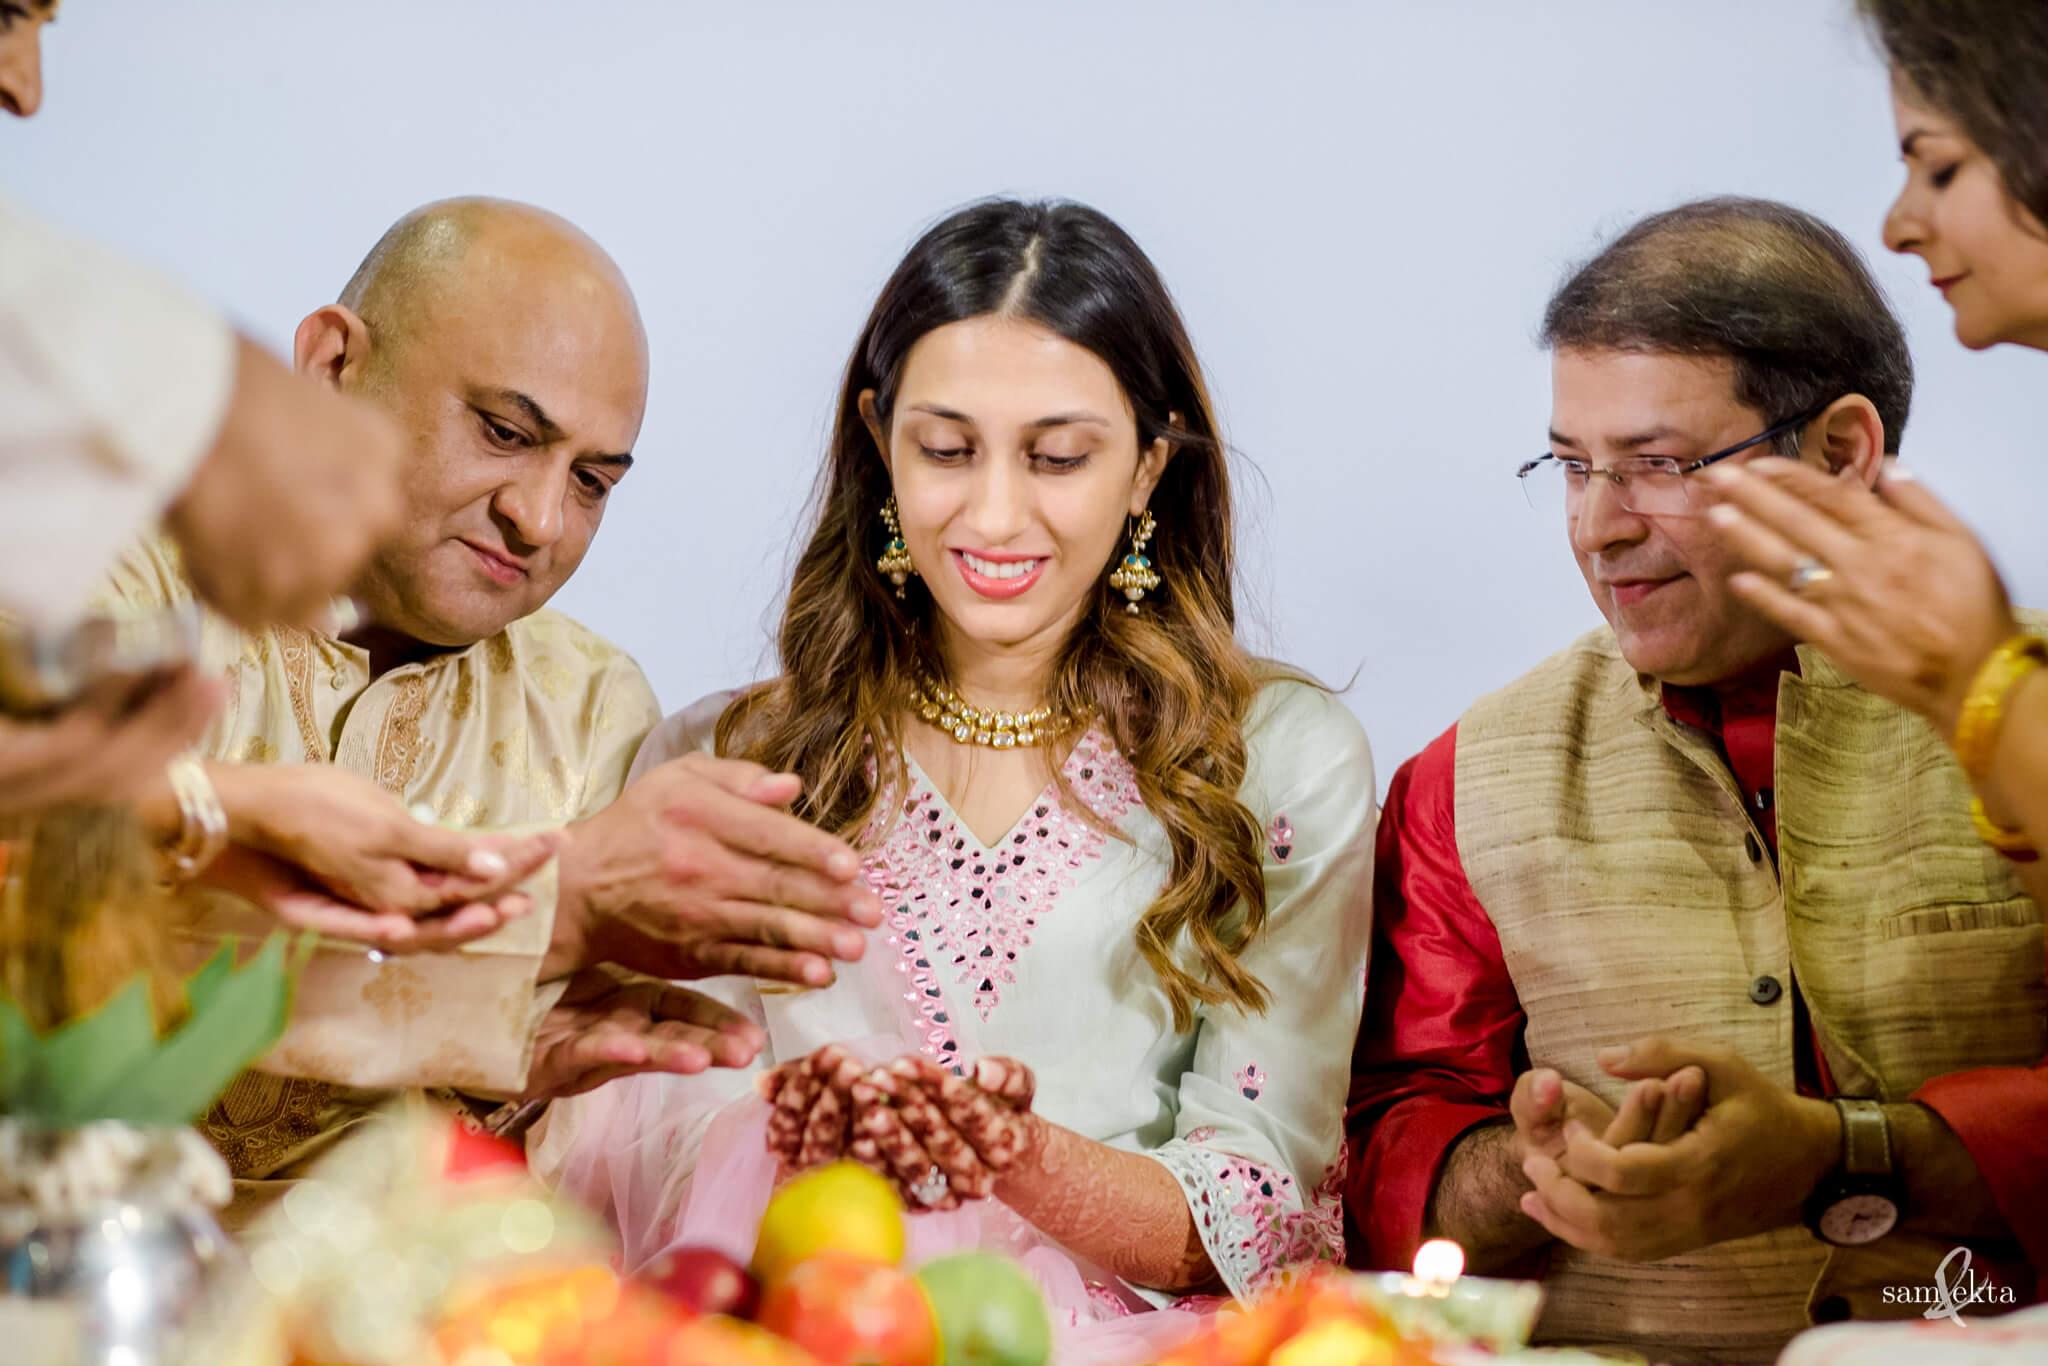 wedding rituals, Armaan Jain And Anissa Malhotra's Wedding